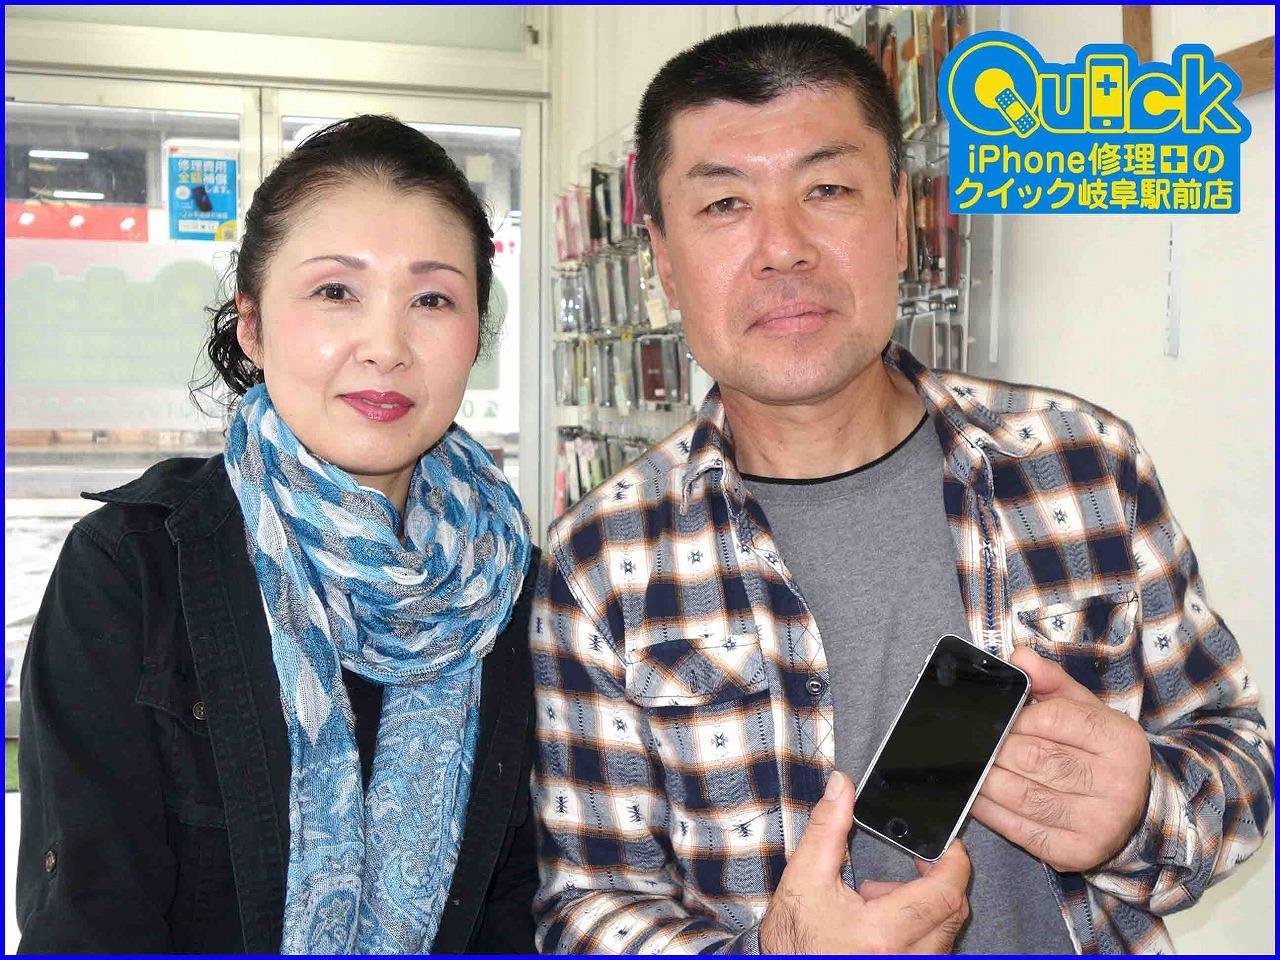 ☆iPhone SEの液晶交換修理に郡上市よりご来店!アイフォン修理のクイック岐阜